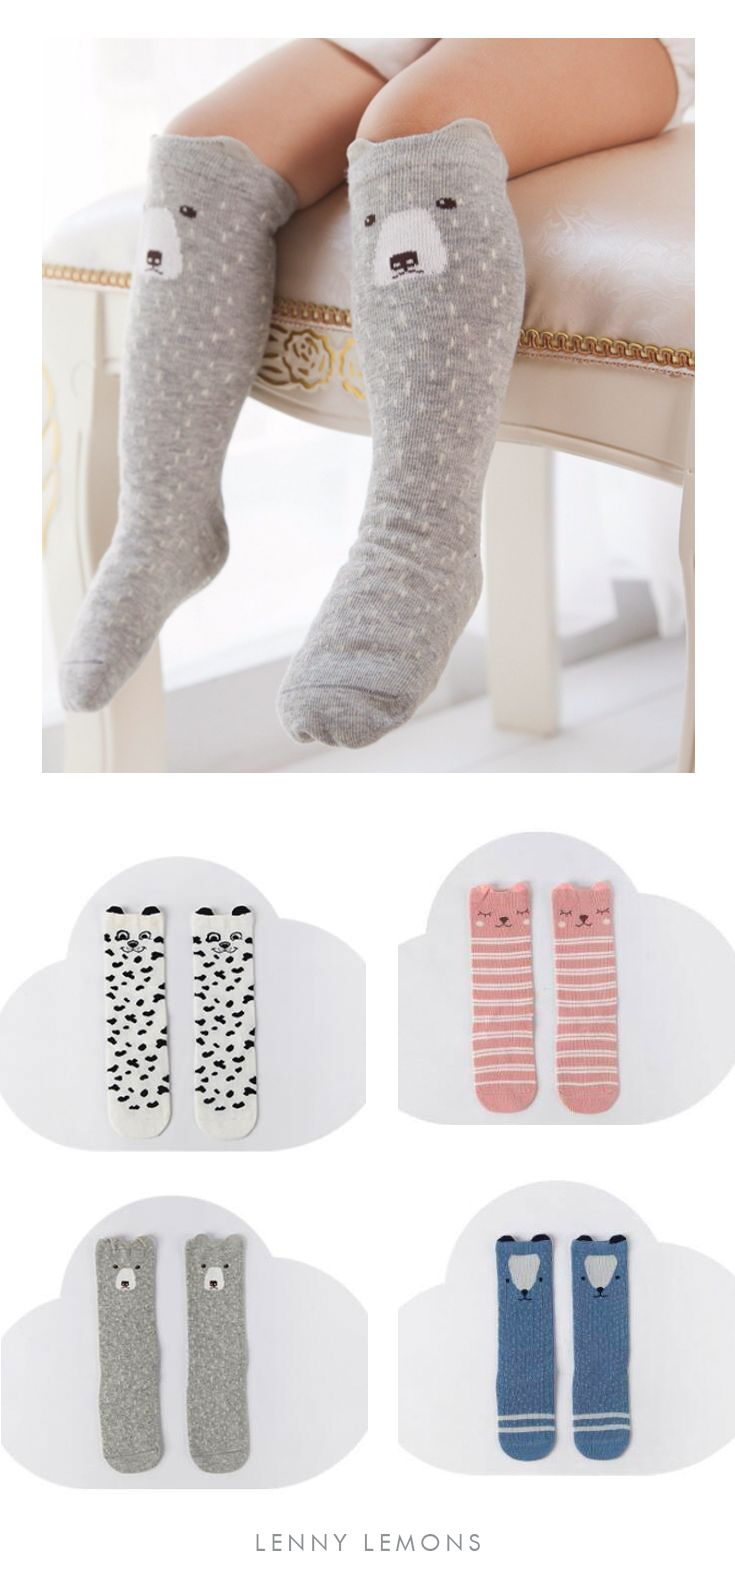 The new adorable trend in socks! Cotton blend. Unisex Cartoon Socks. Lenny Lemons, Babies and Toddler Apparel #lennylemons #babies #toddlers